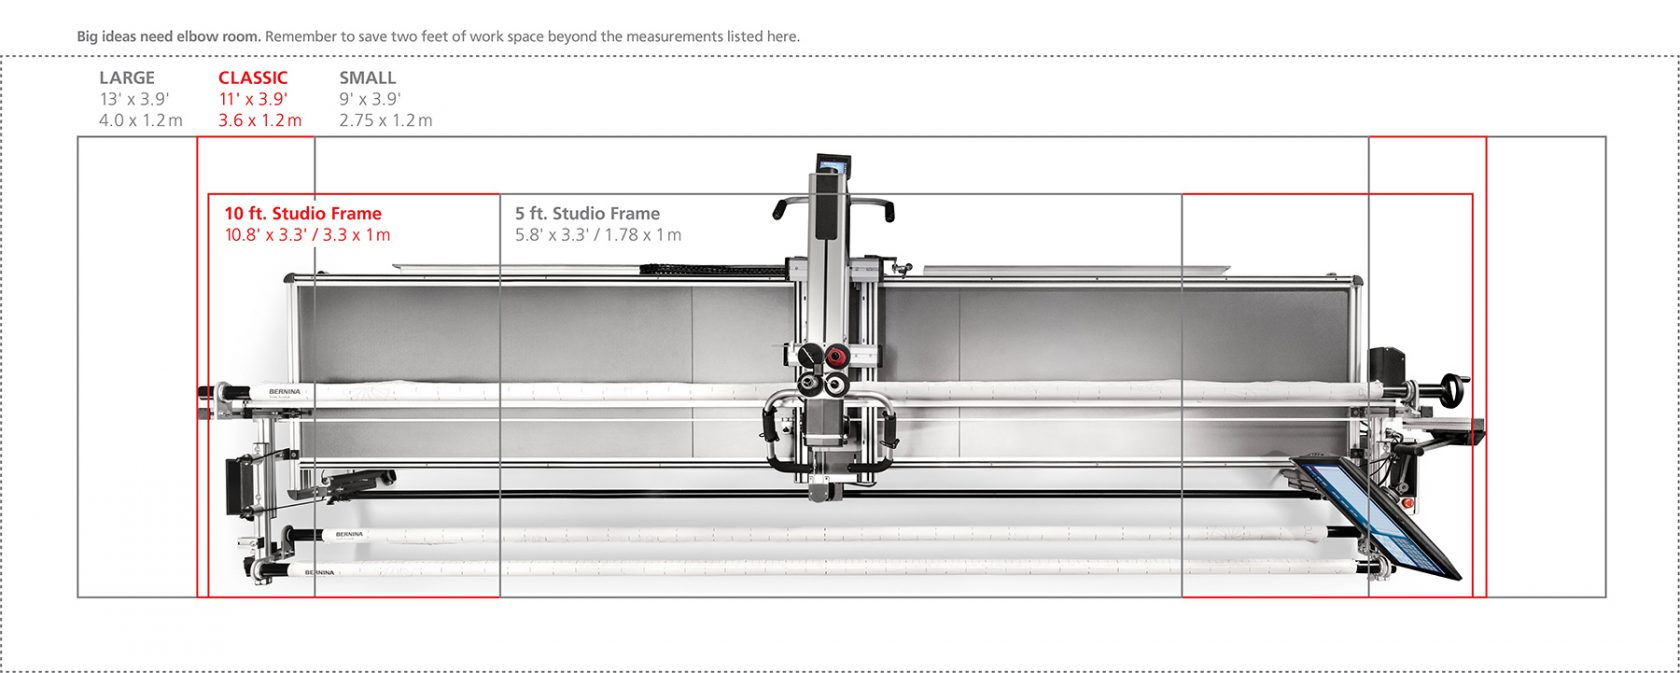 BERNINA-Longarm-Machines-on-Frame-Floor-plan-2021